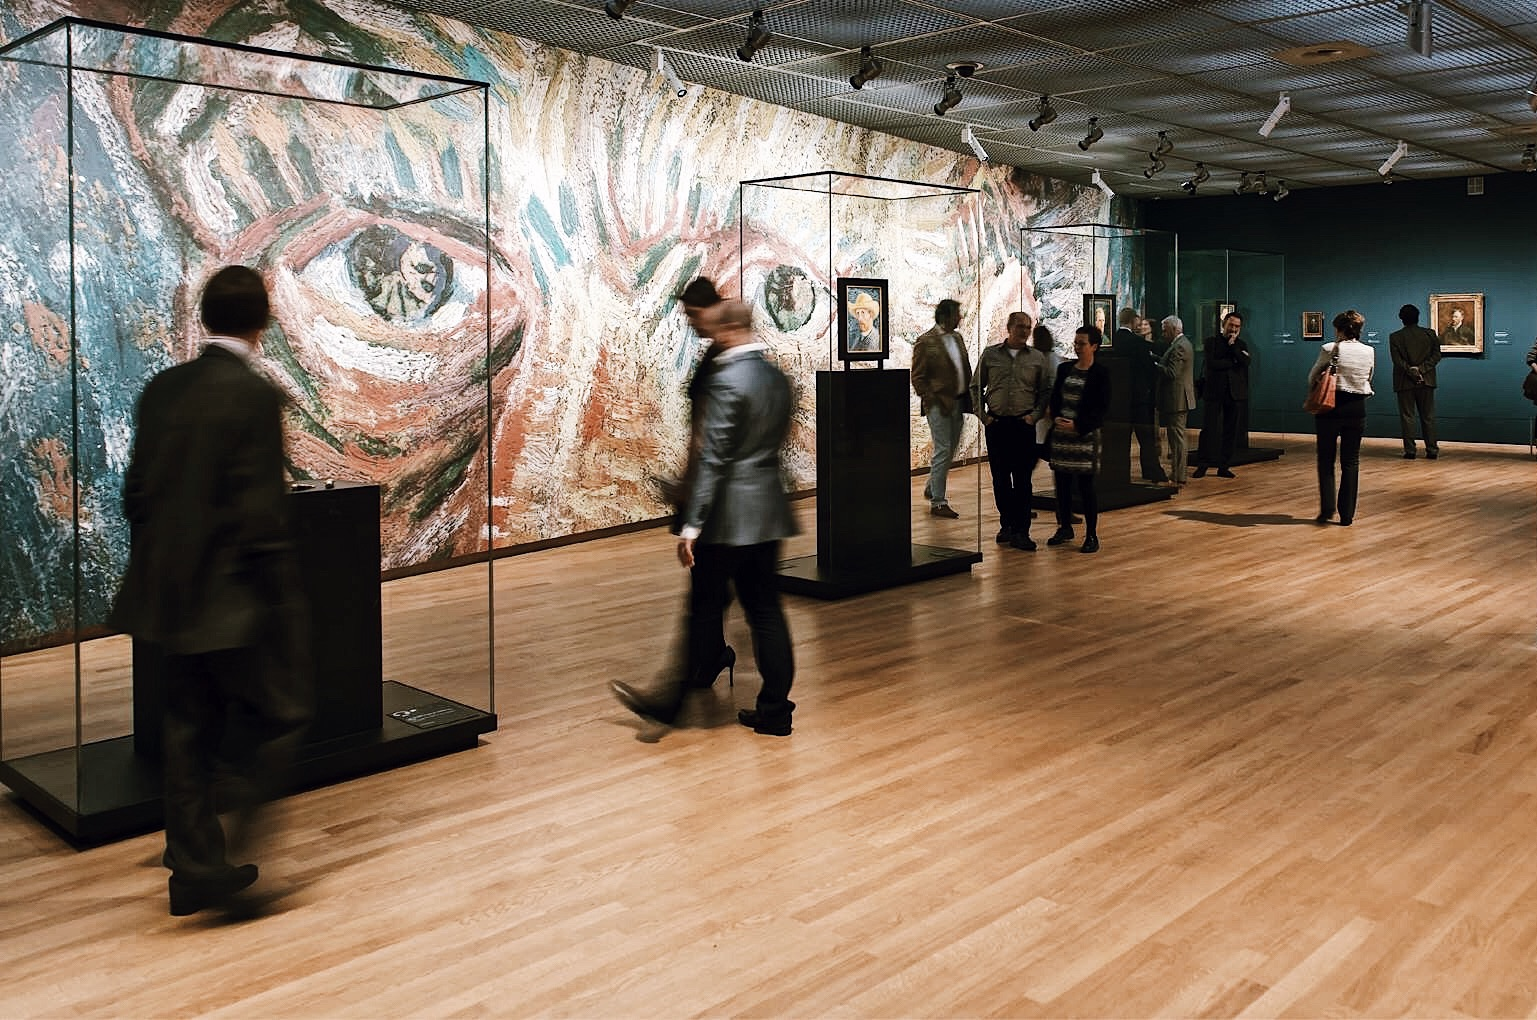 Tour-Van-Gogh-Museum-Guided-Amsterdam